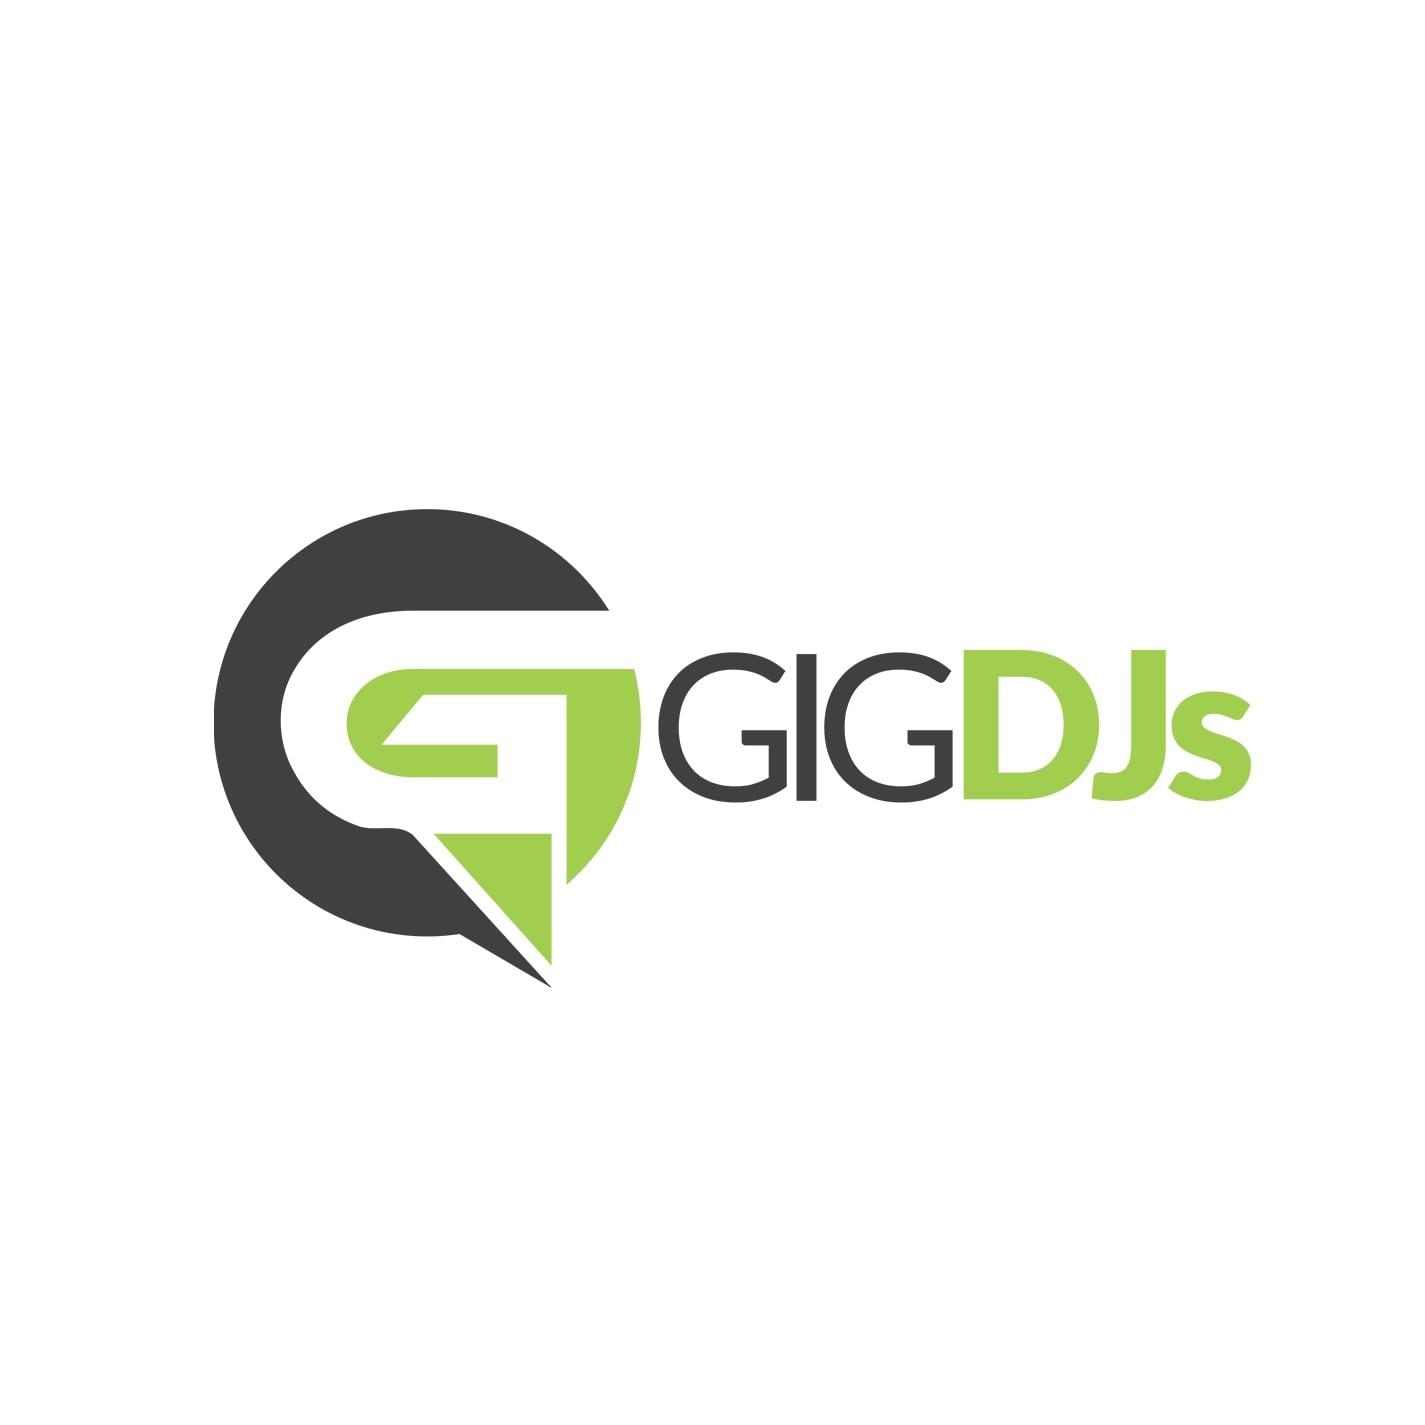 gigdjs-logo-design-accolademedia